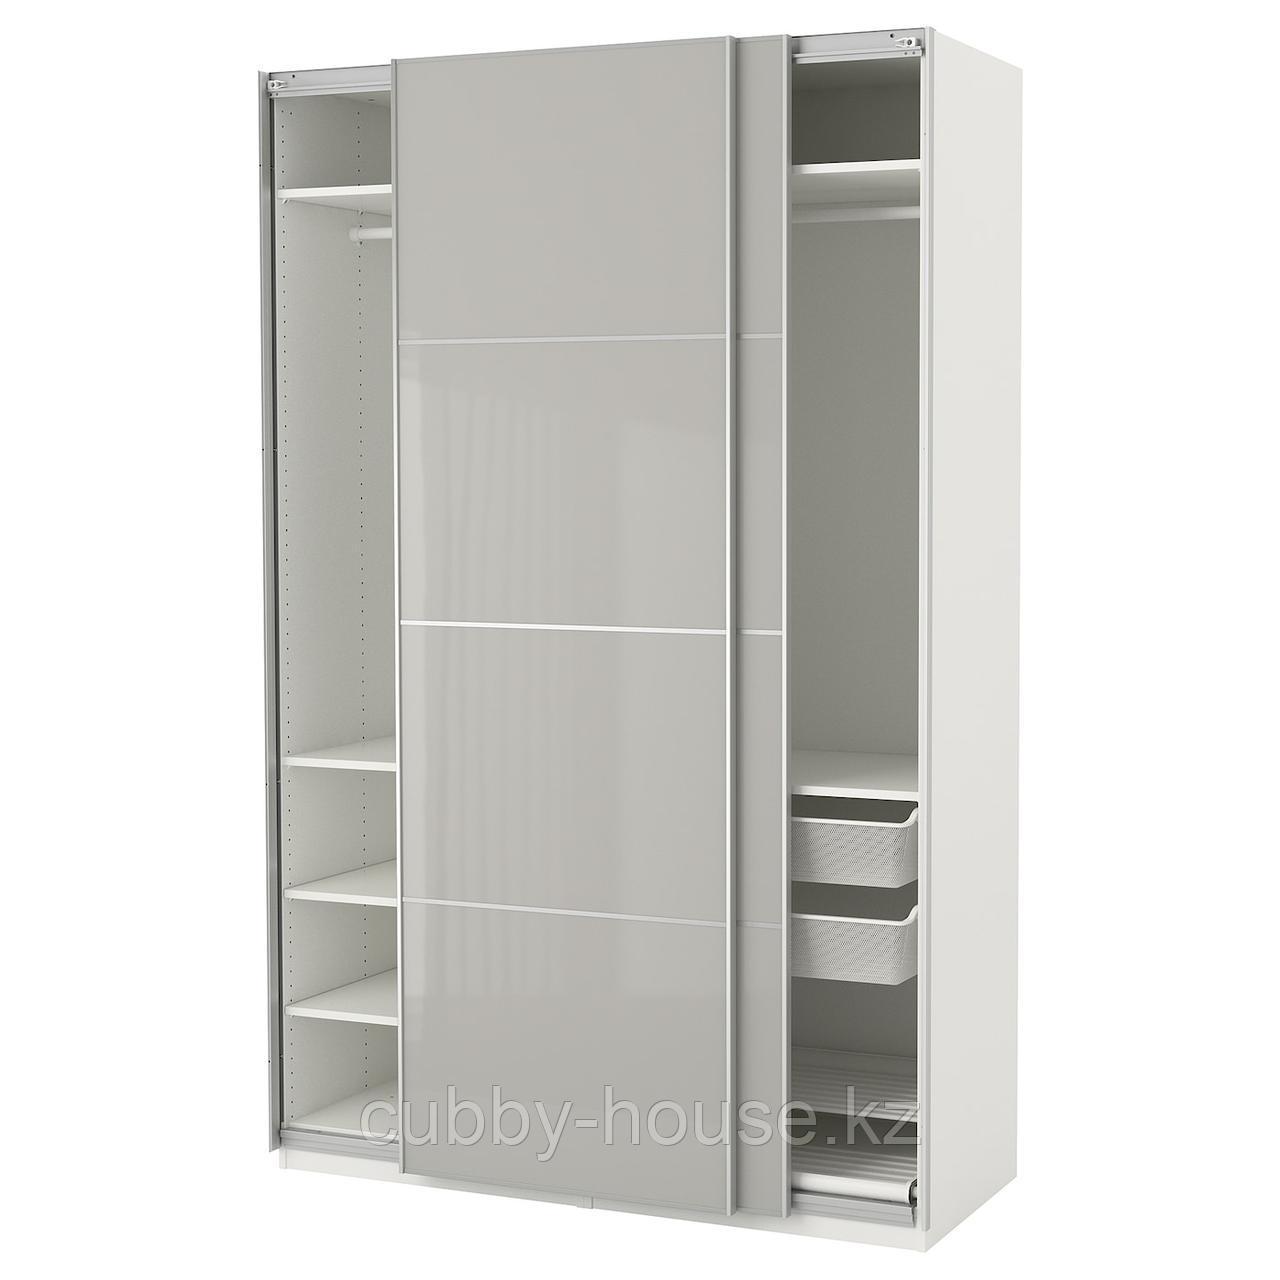 ПАКС Гардероб, белый Хокксунд, глянцевый светло-серый, 150x66x236 см